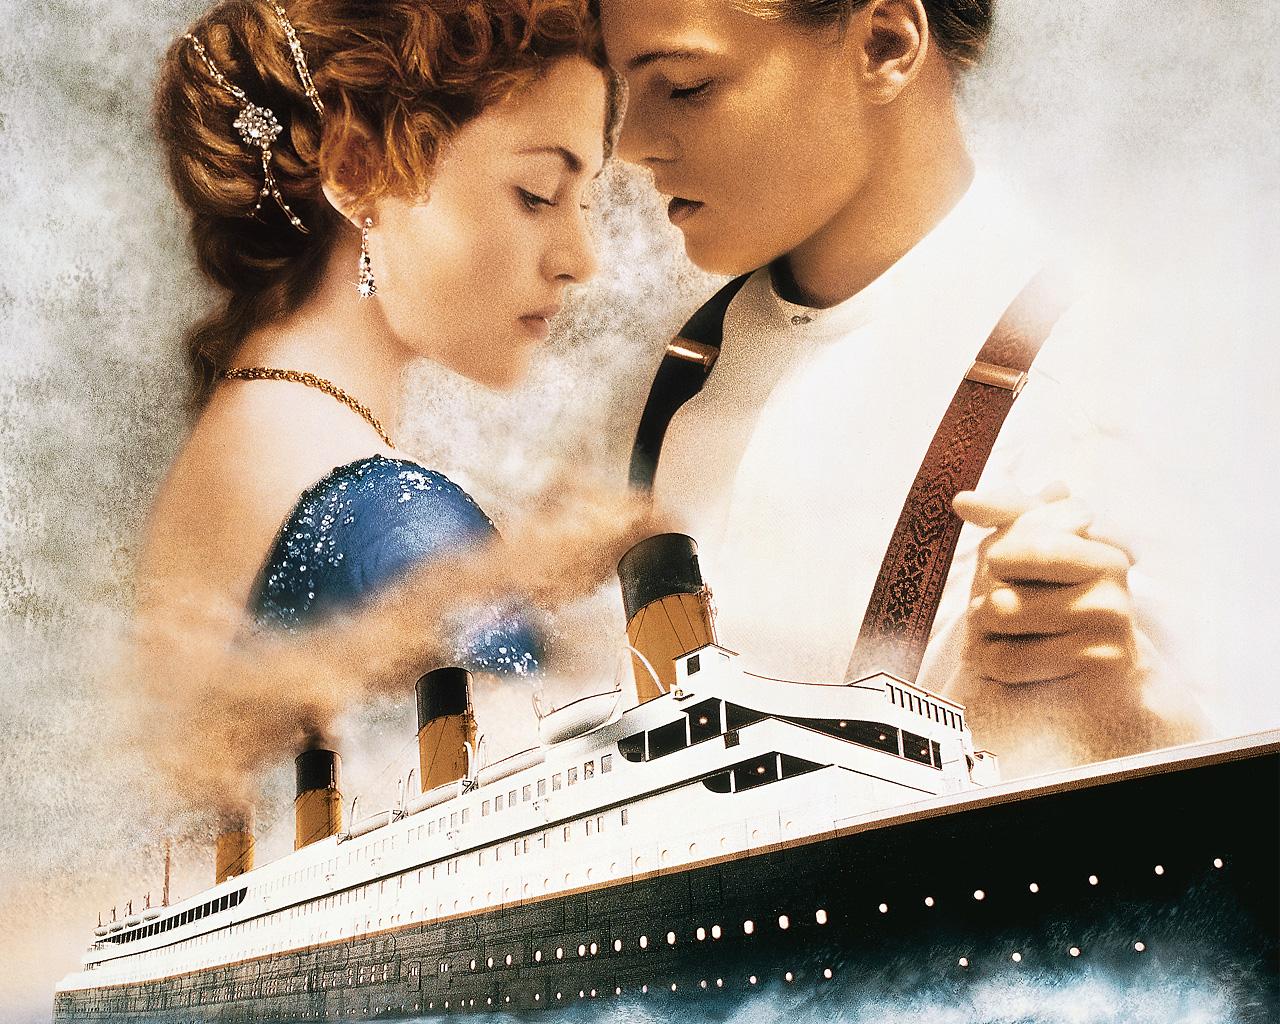 http://1.bp.blogspot.com/-va5WNKUR6dc/TgAUGLpFlaI/AAAAAAAABMc/4ZjVfE8yjno/s1600/titanic.jpg